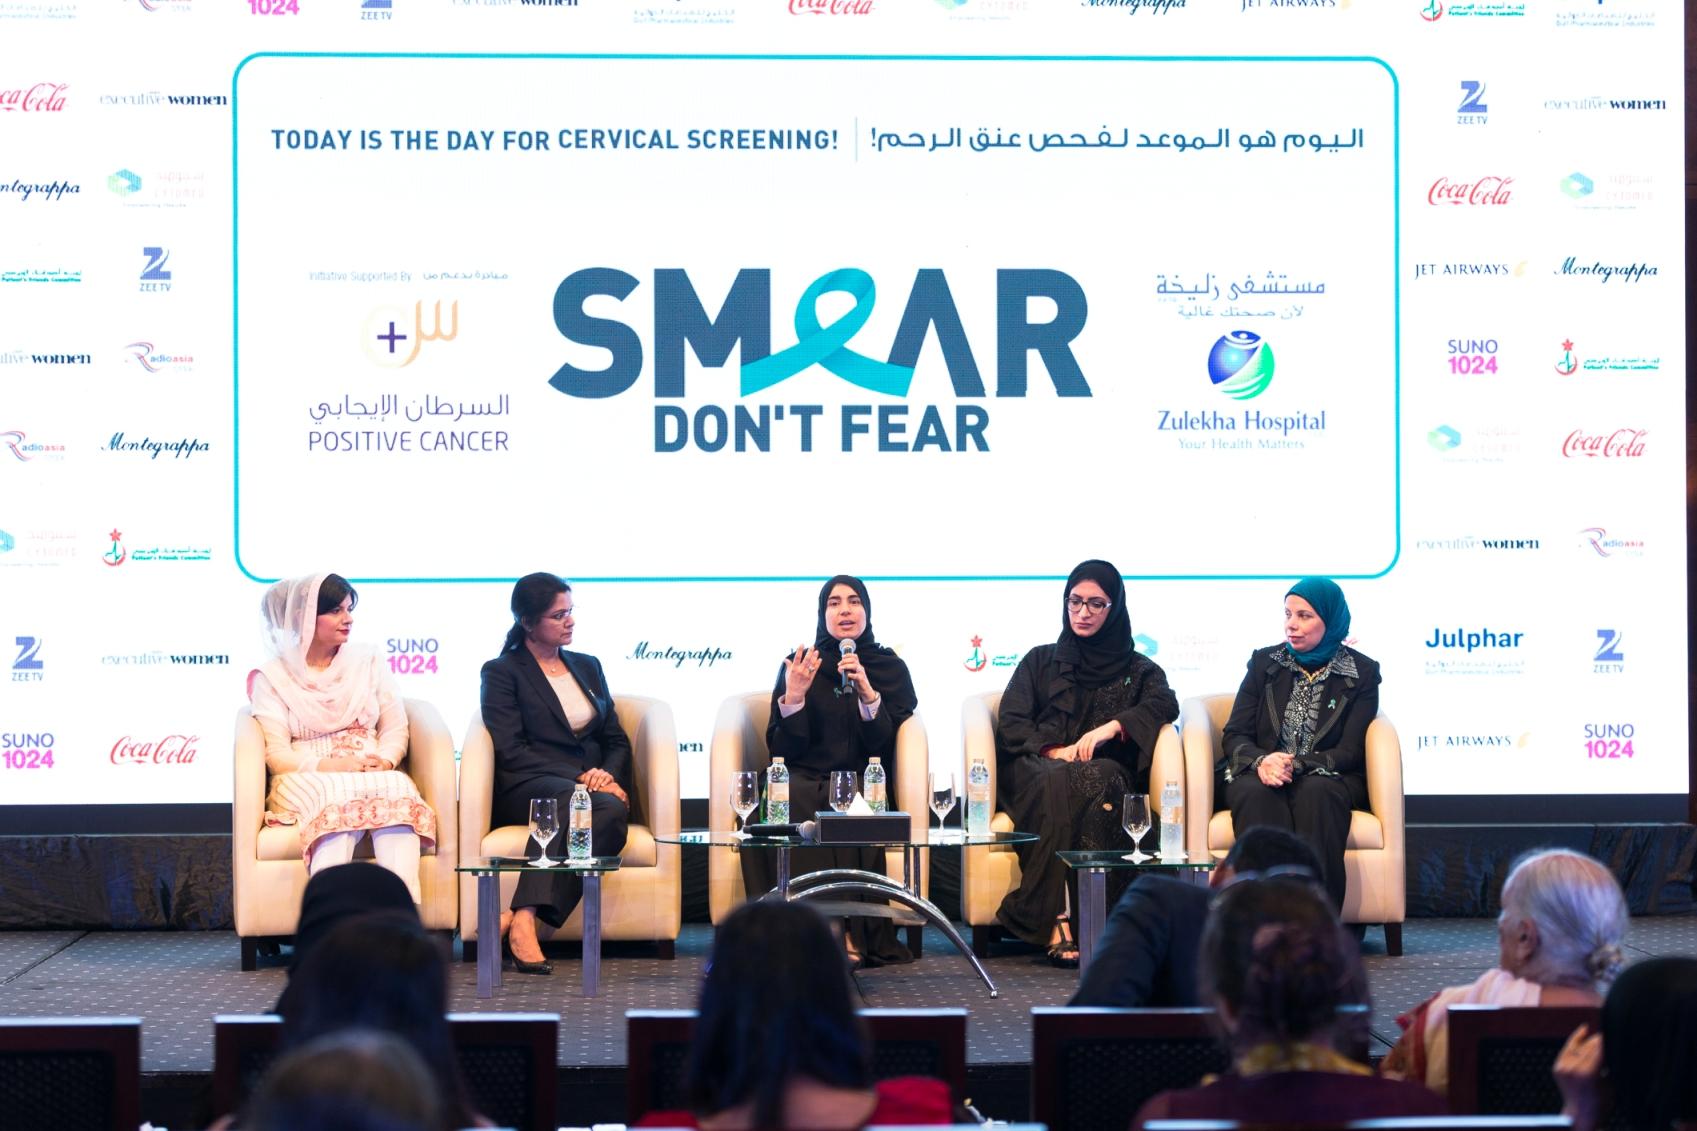 Zulekha Hospital Cervical Cancer Campaign Speakers Panel